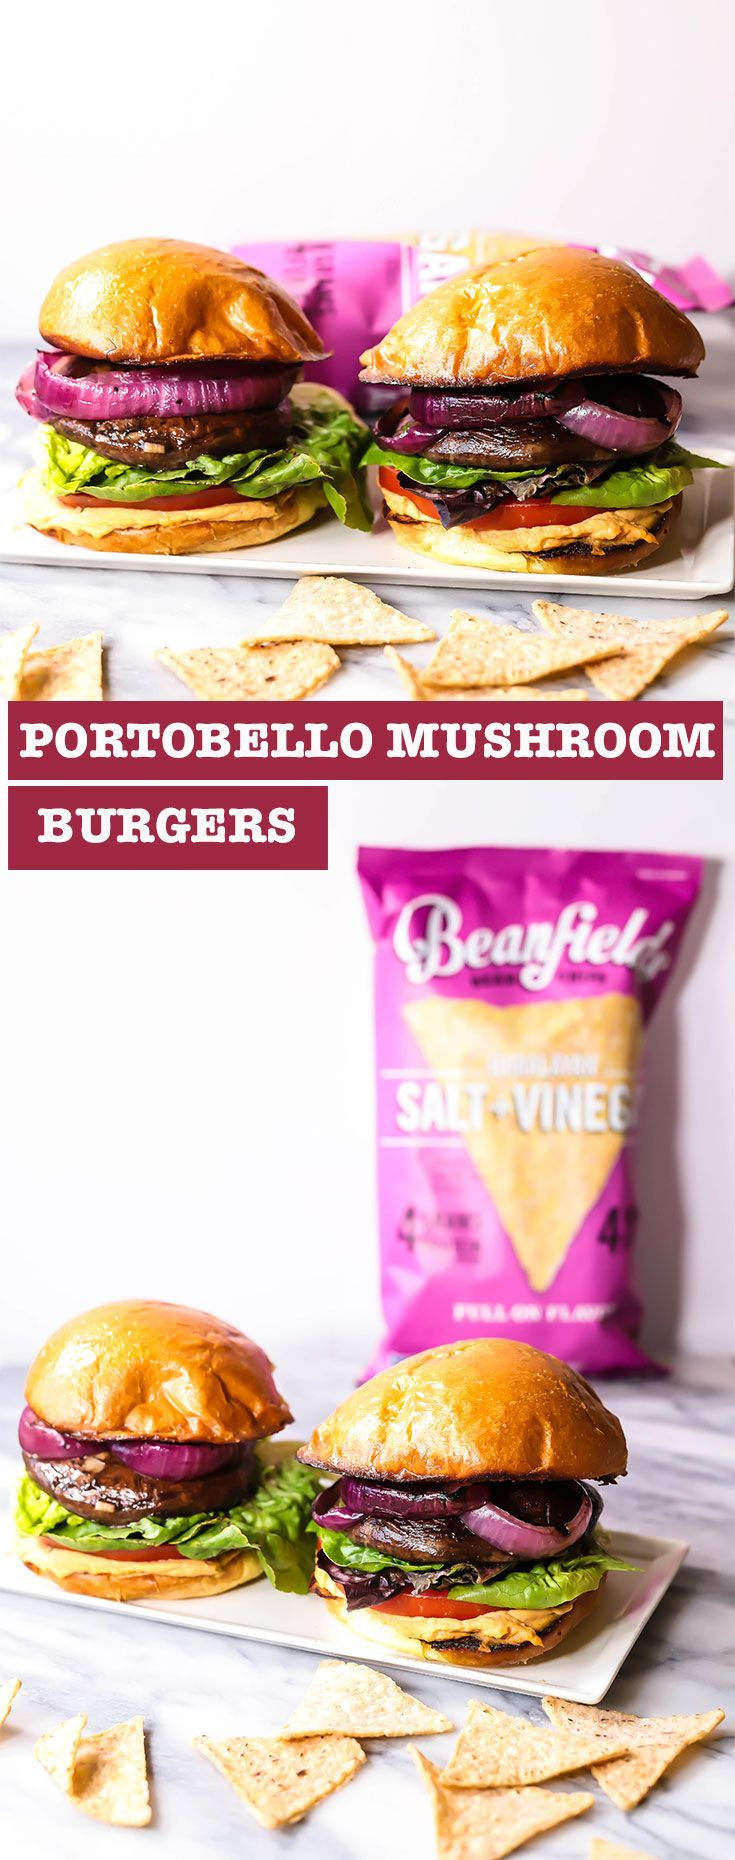 Beanfields vegan and gluten free bean chips and snacks